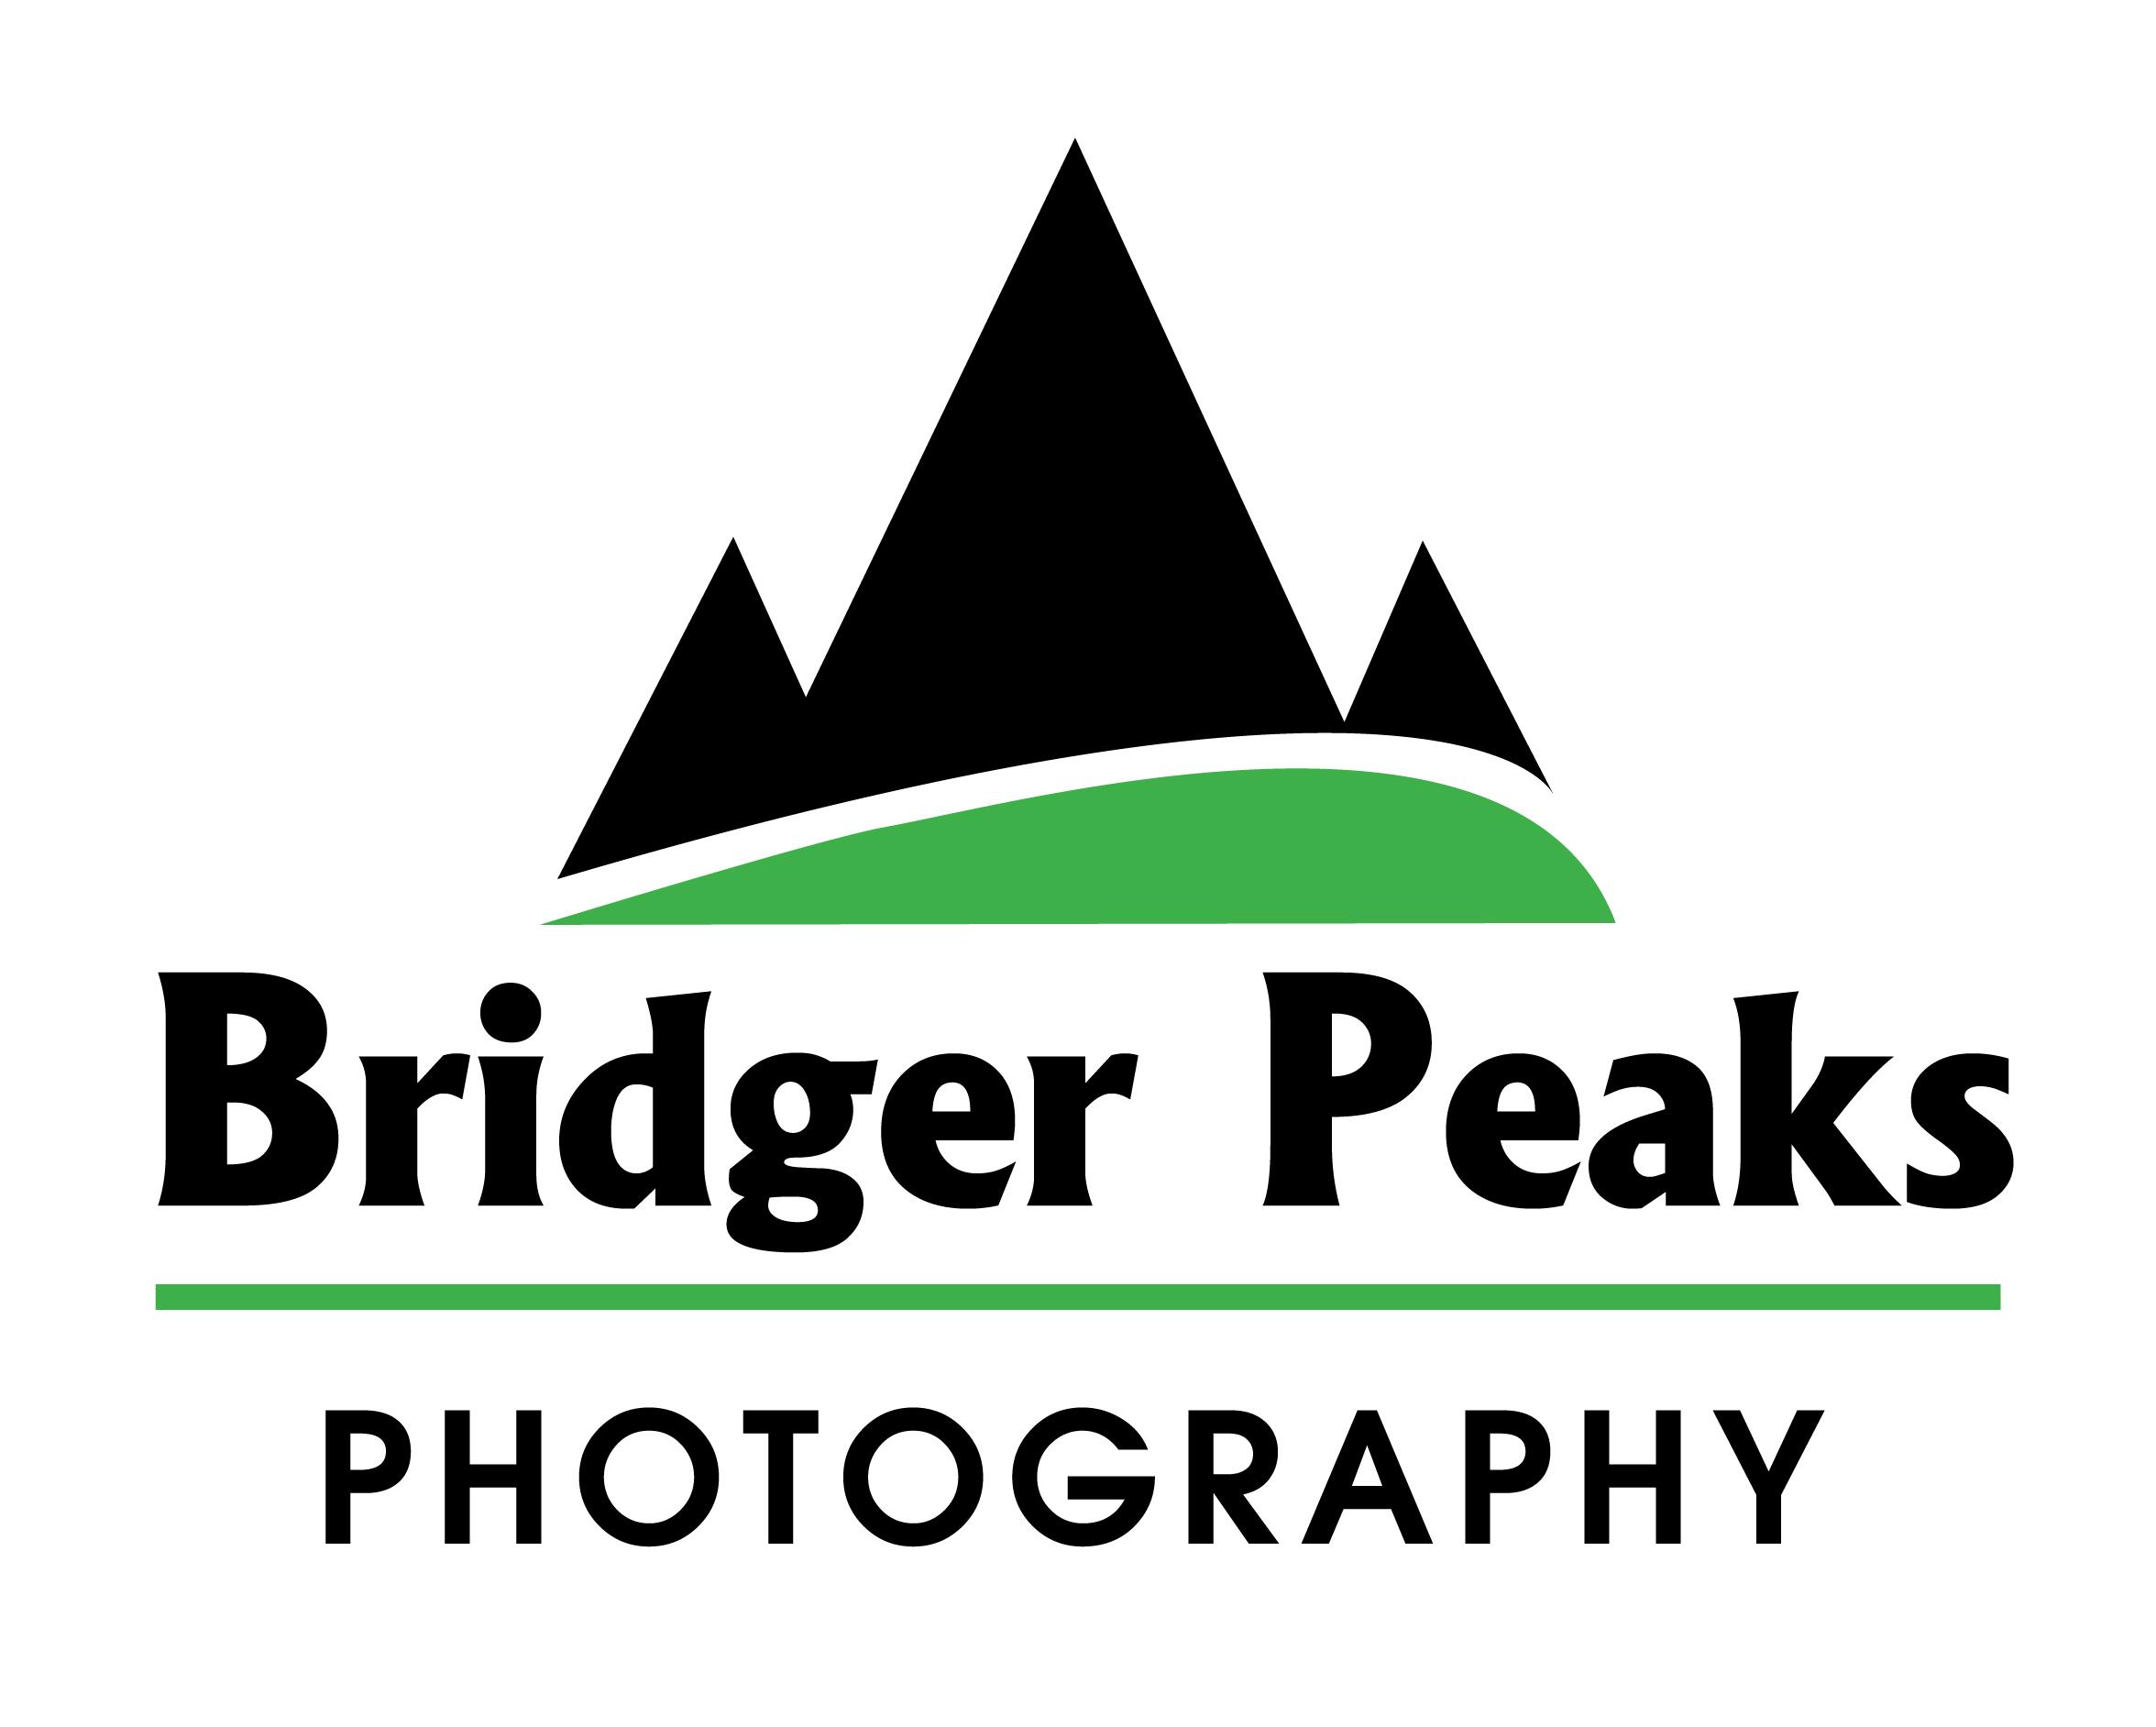 Bridger Peaks Photography